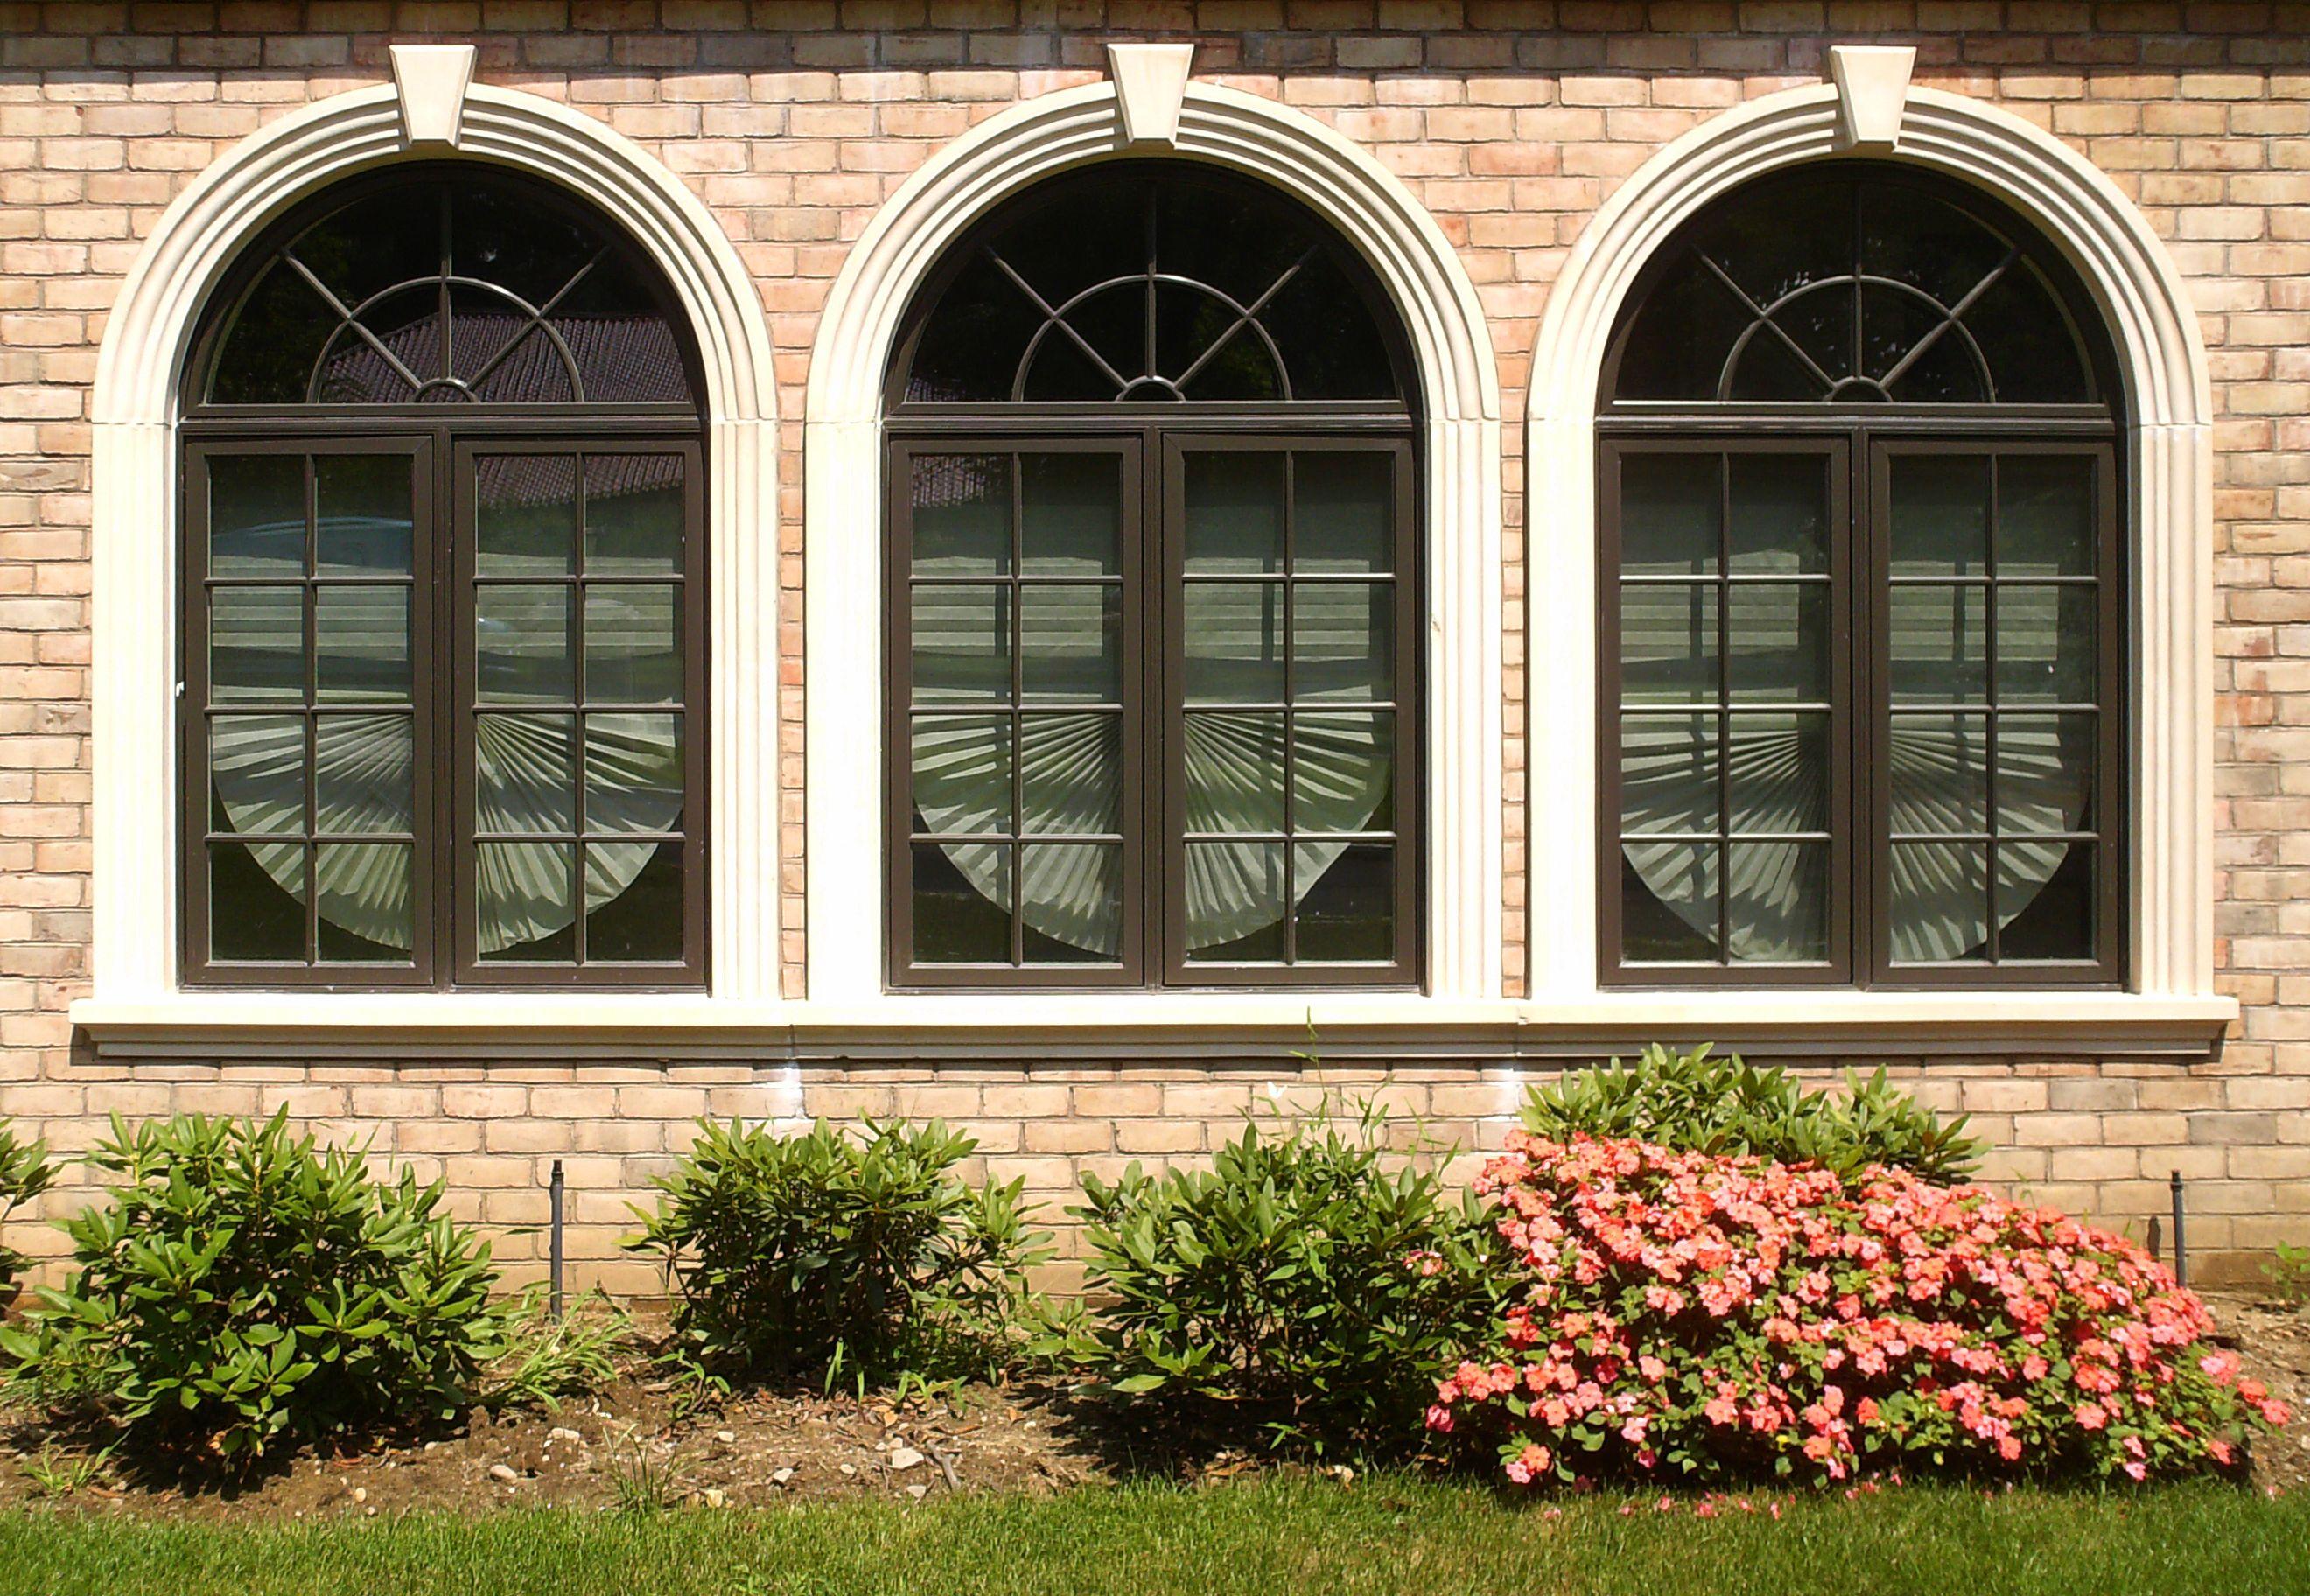 3 Windows With Precast Arch Surrounds And Keystones Www